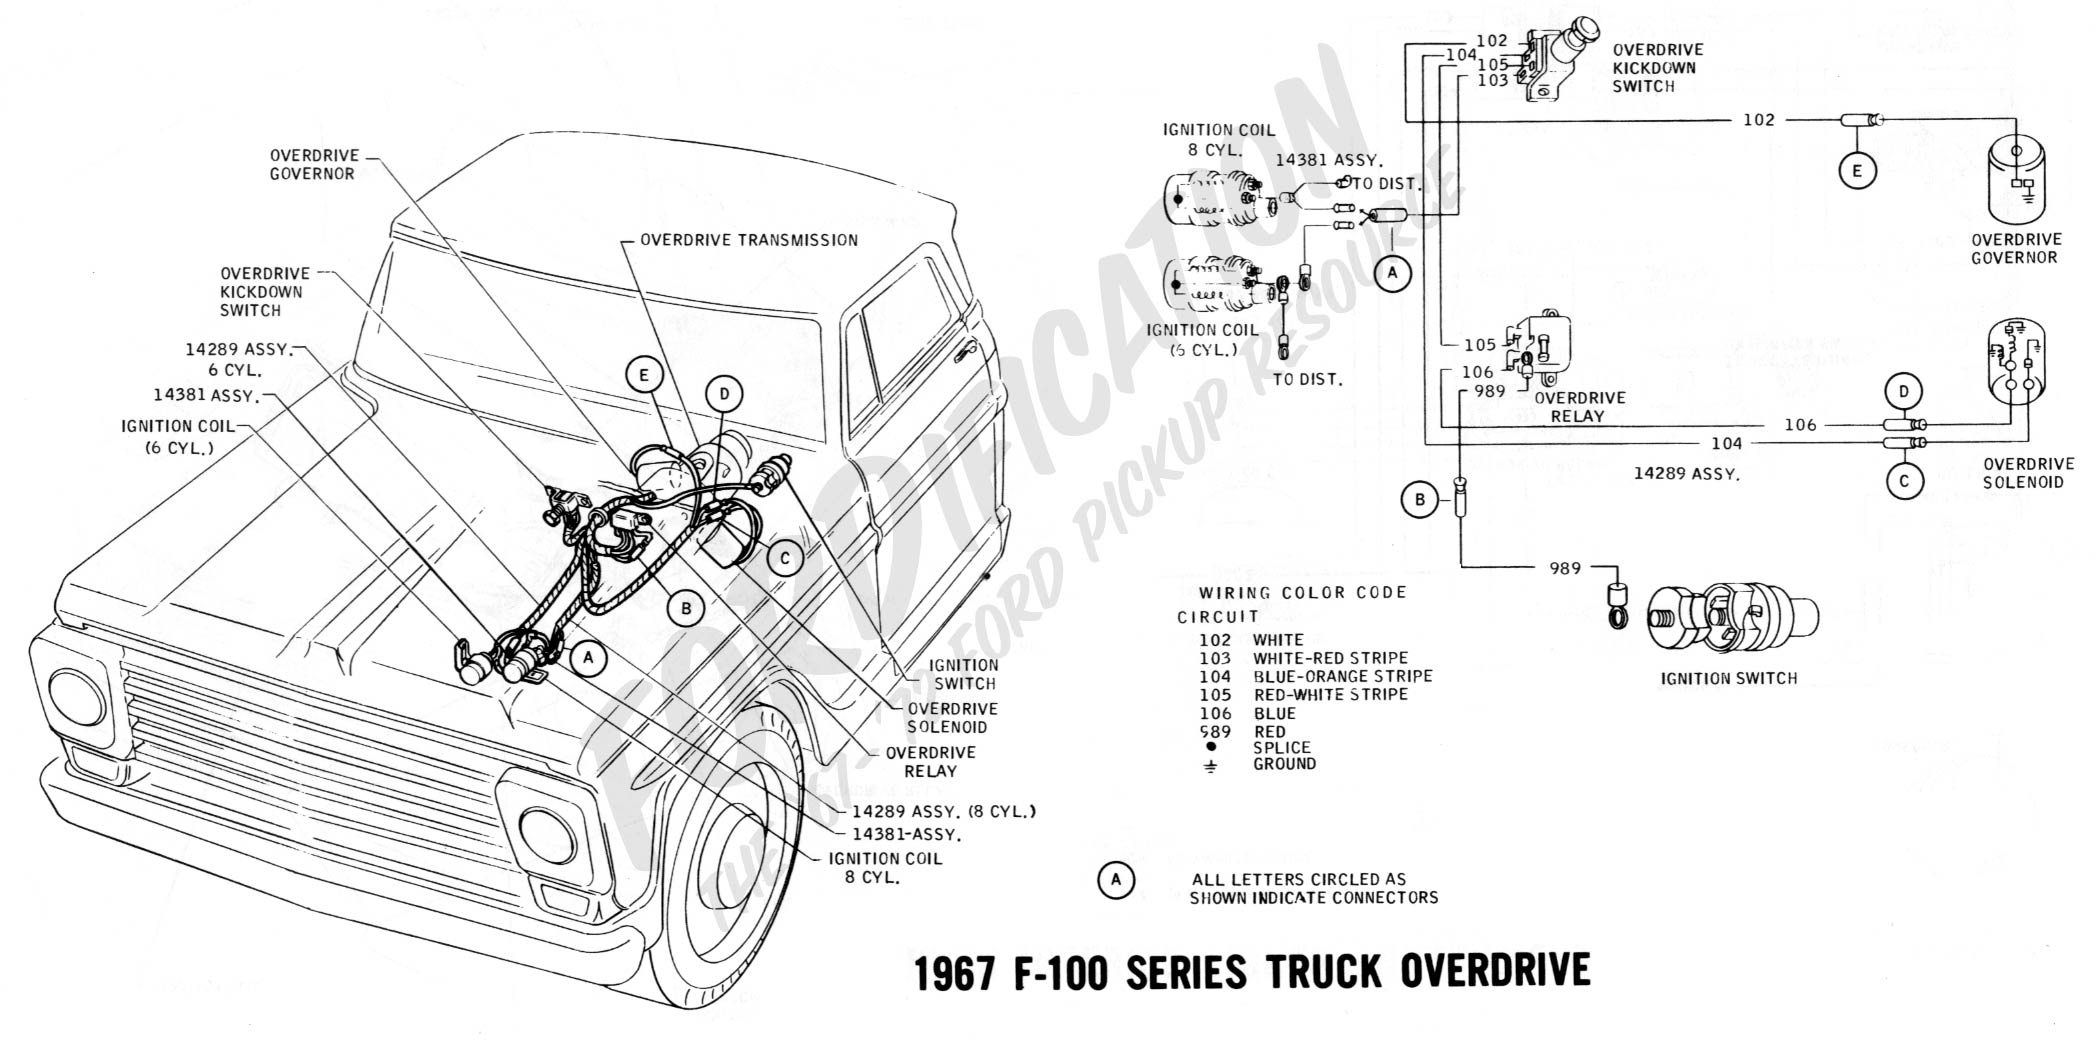 1981 Chevy Truck Wiring Diagram Pickup